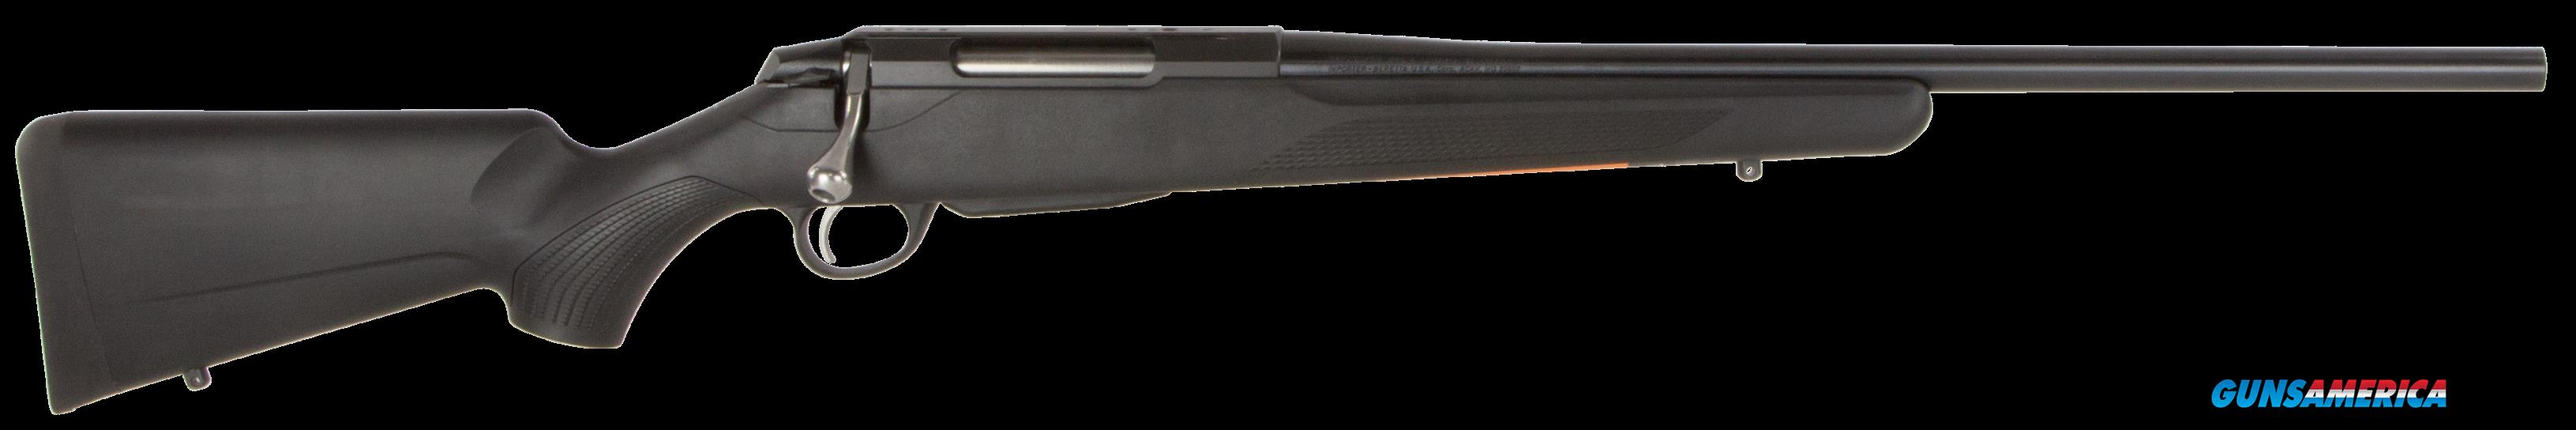 Tikka T3 T3x, Tikka Jrtxe314c   T3x Lite  22250   Syn  Guns > Pistols > 1911 Pistol Copies (non-Colt)